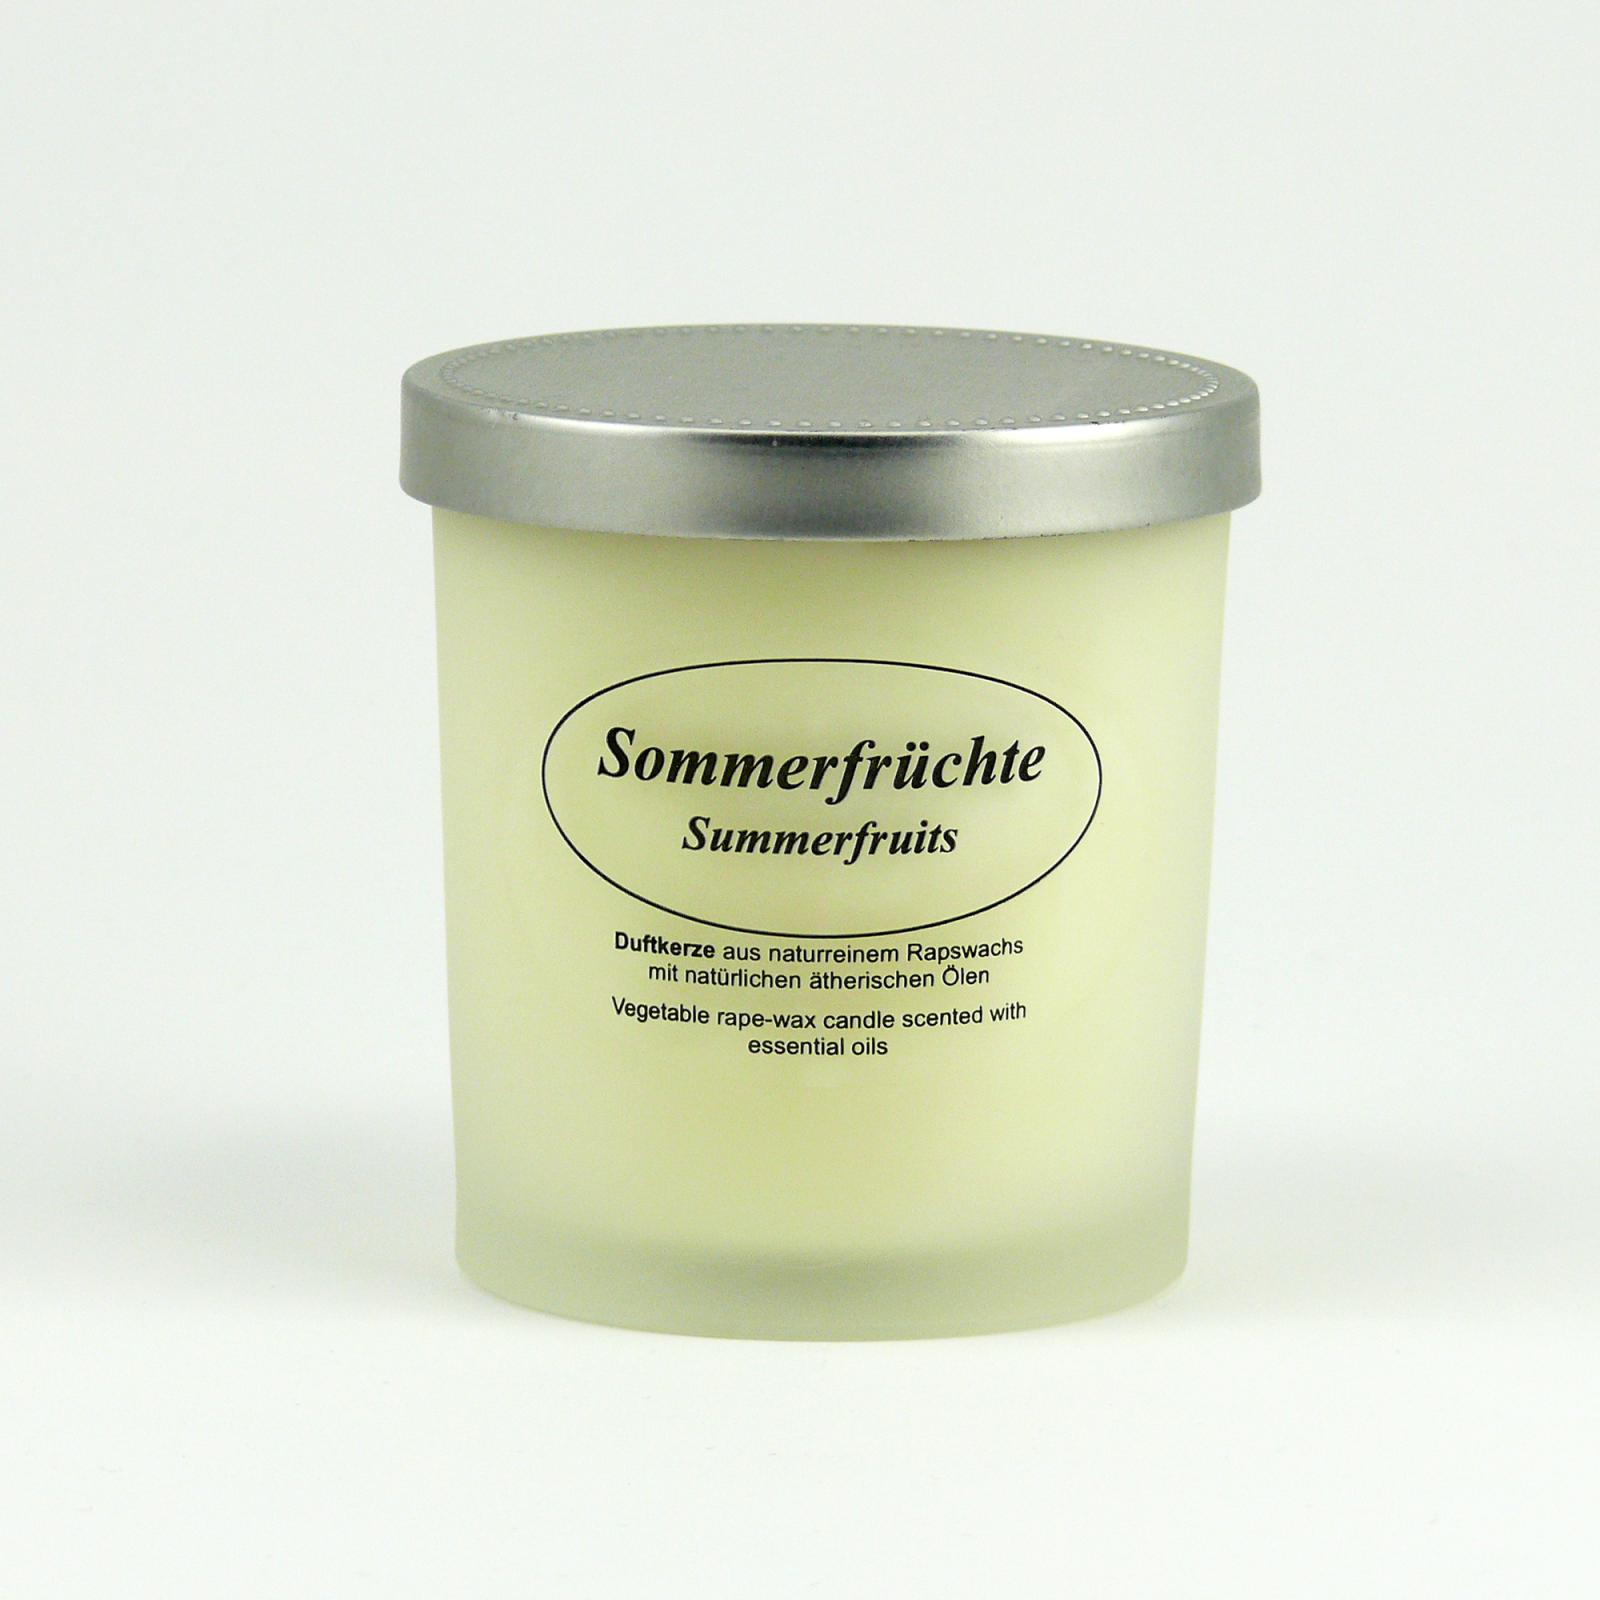 Kerzenfarm Přírodní svíčka Summer Fruits, mléčné sklo 8 cm